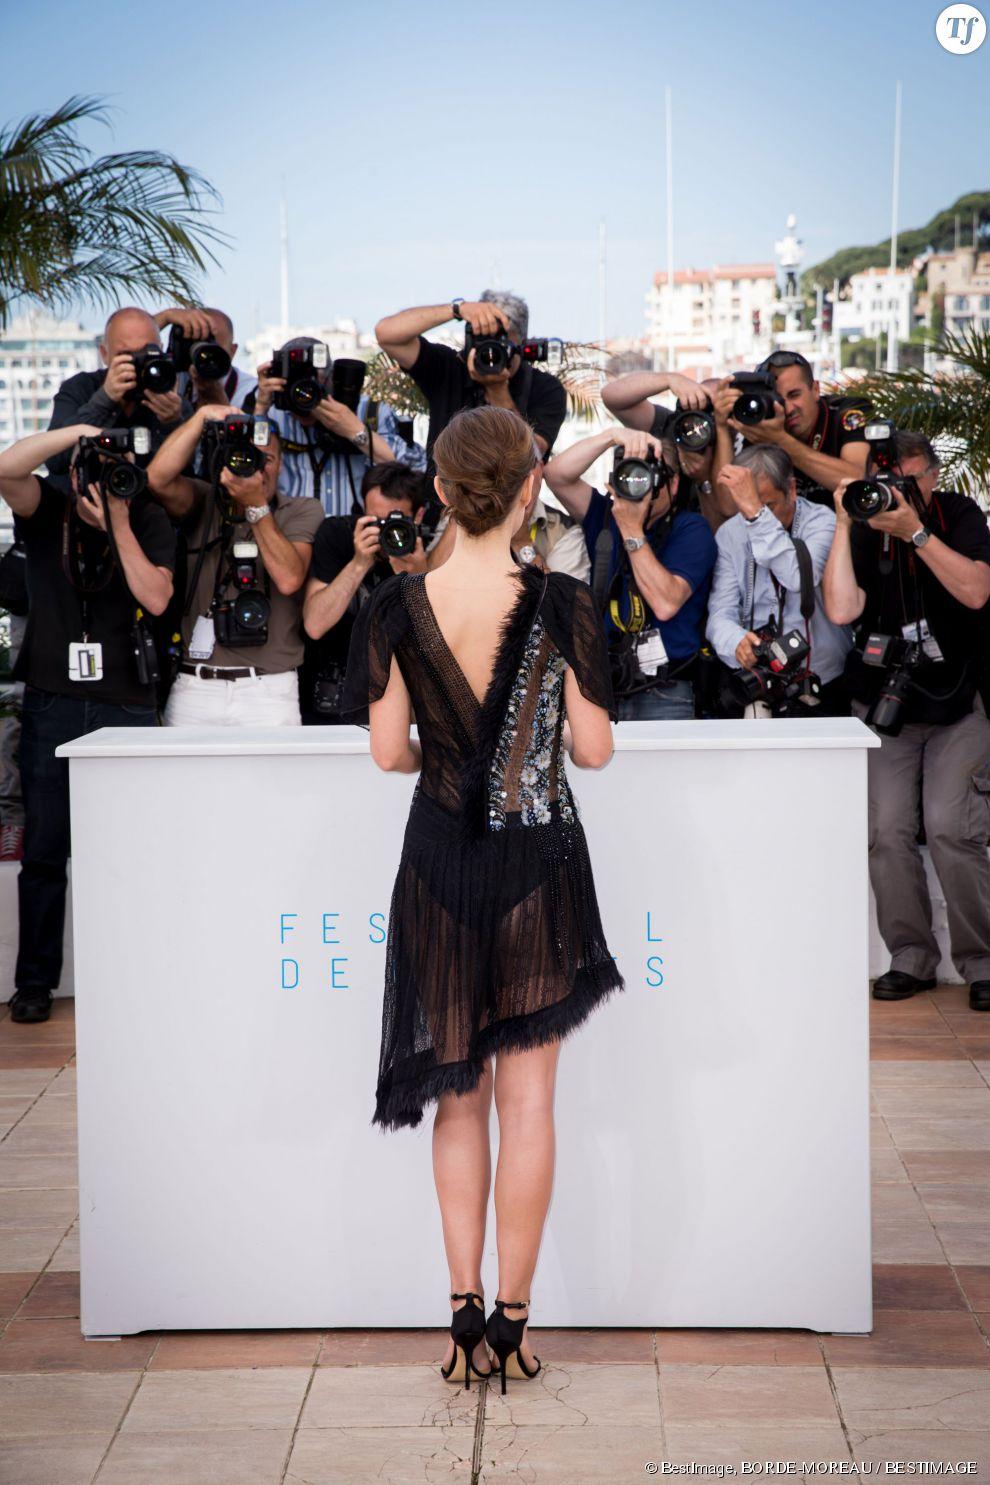 La robe olé-olé de Natalie Portman